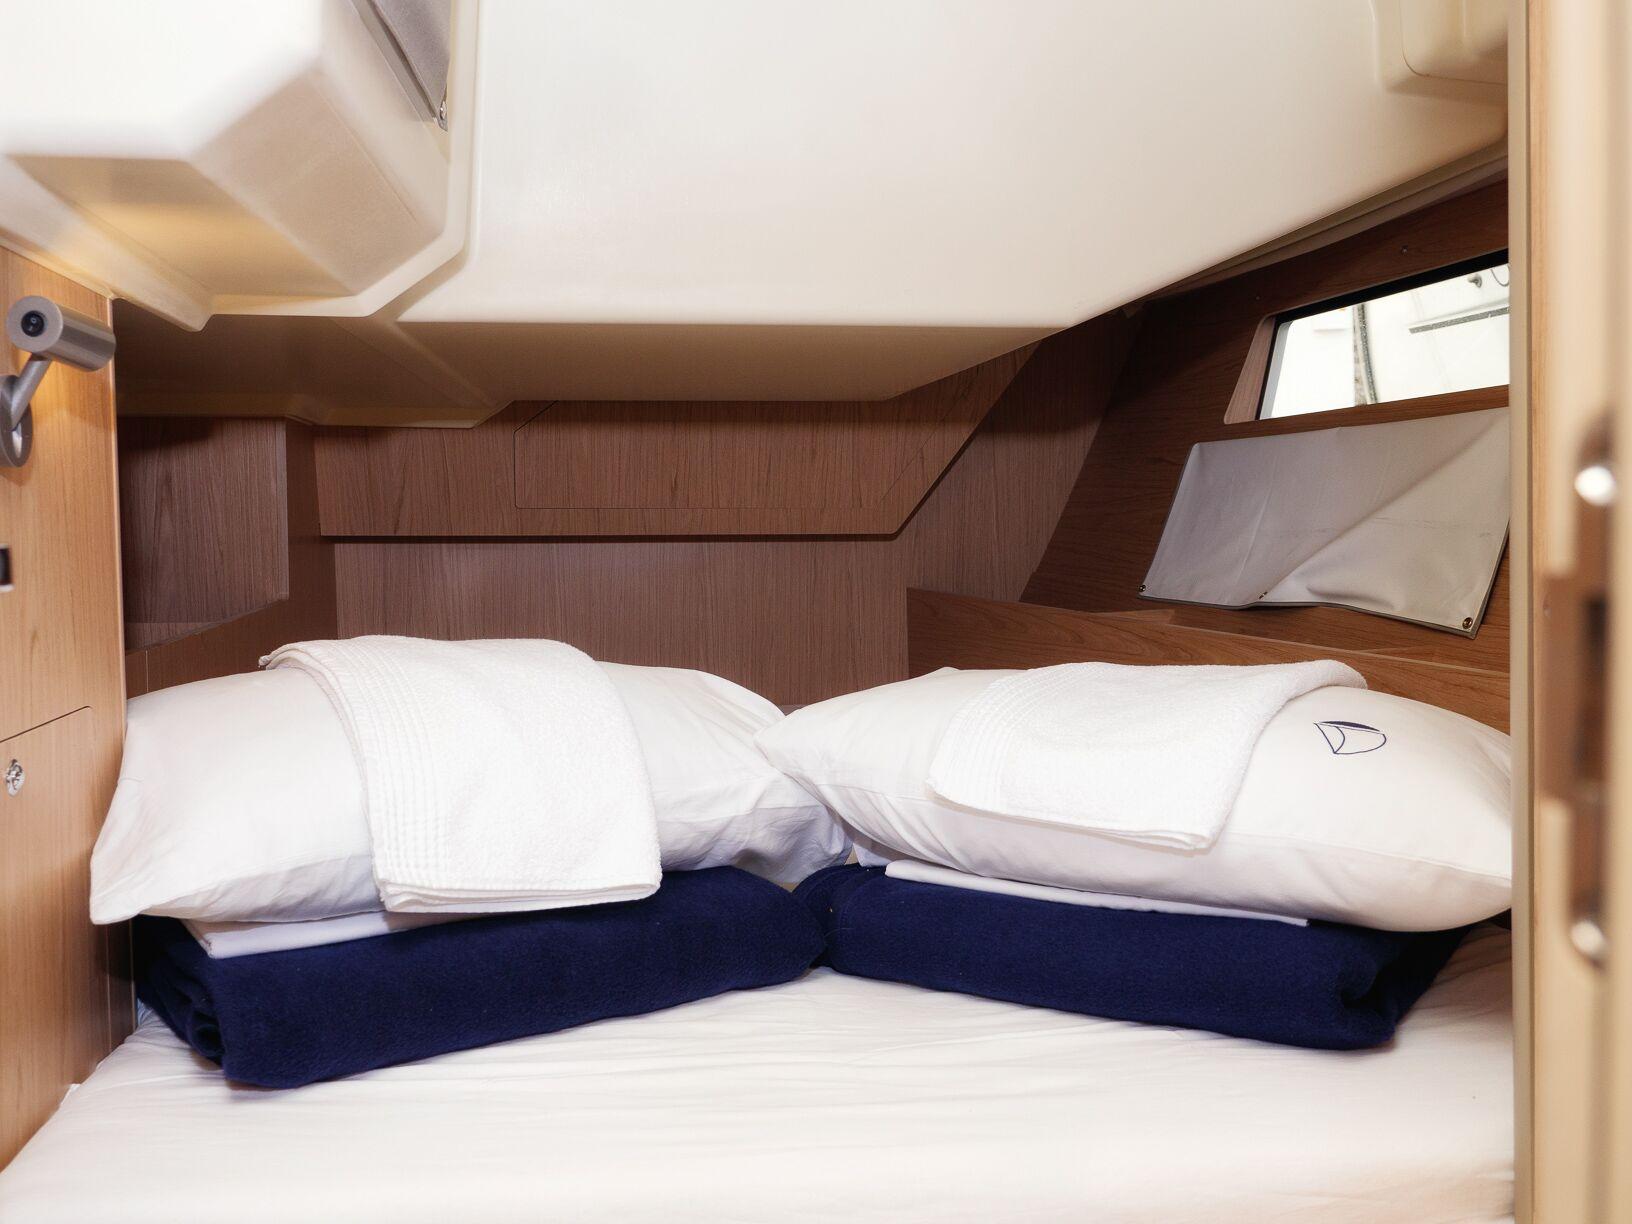 Oceanis 41.1 (GOA) Interior - cabin (photo taken 2019) - 22